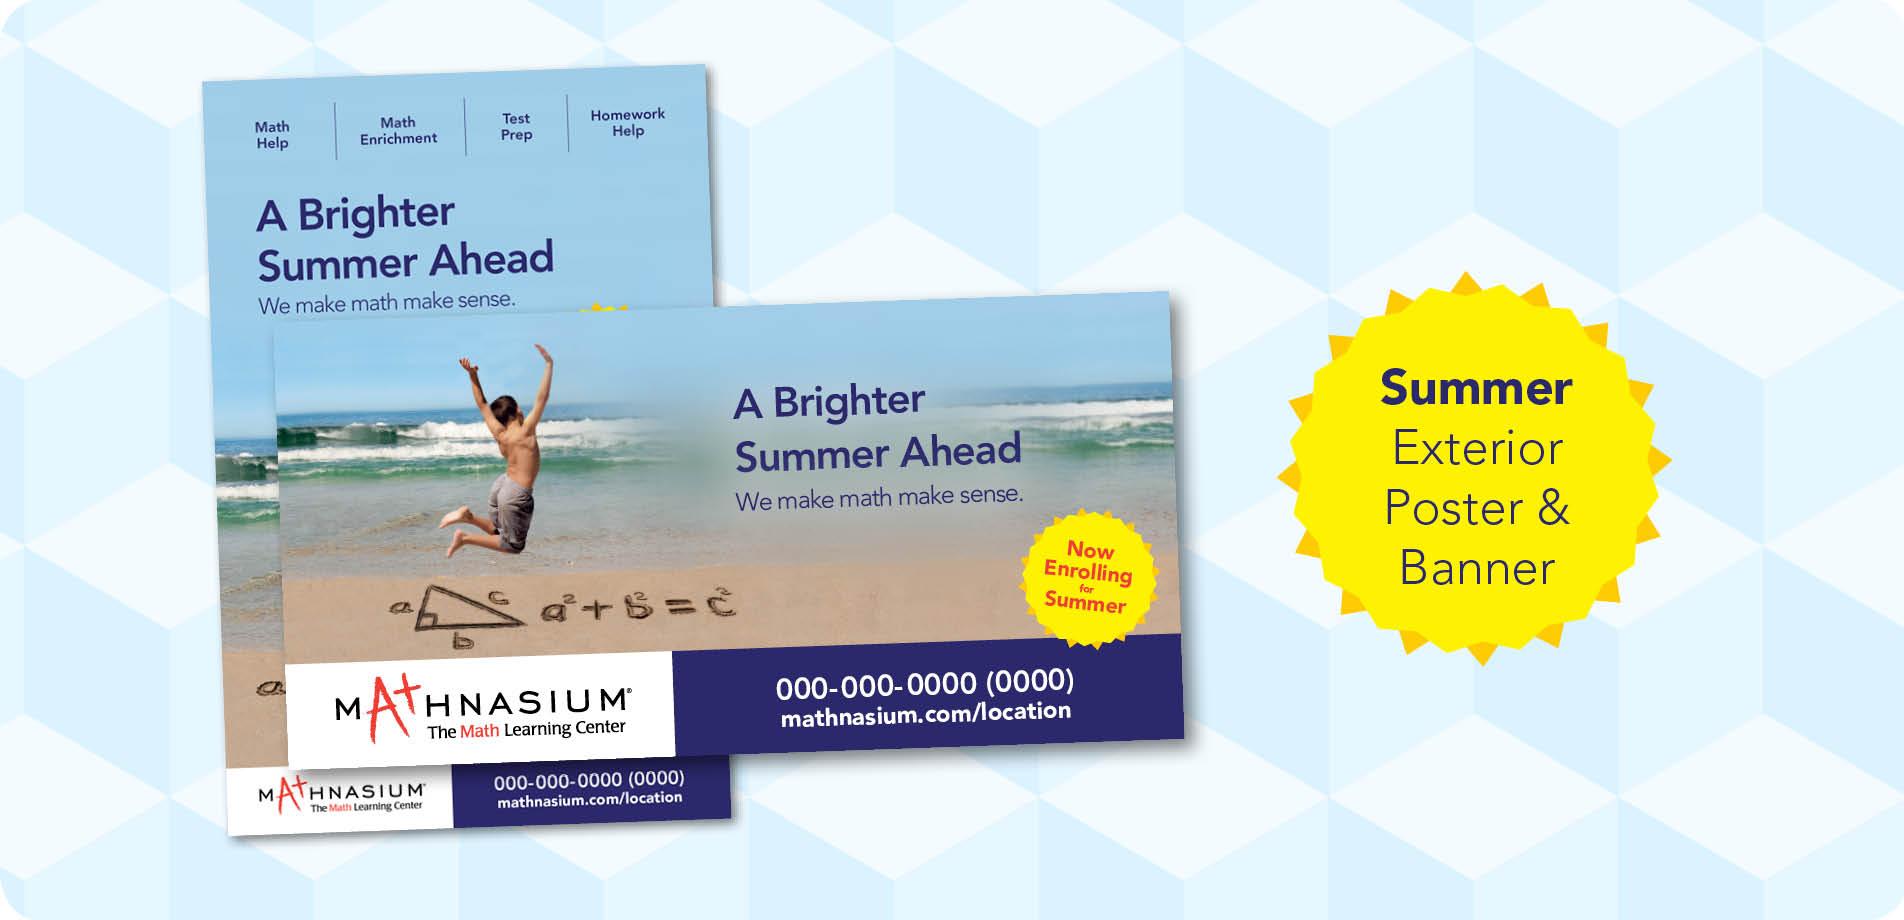 Sample-Email-Summer-Beach-Exterior-Poster-Banner-2016